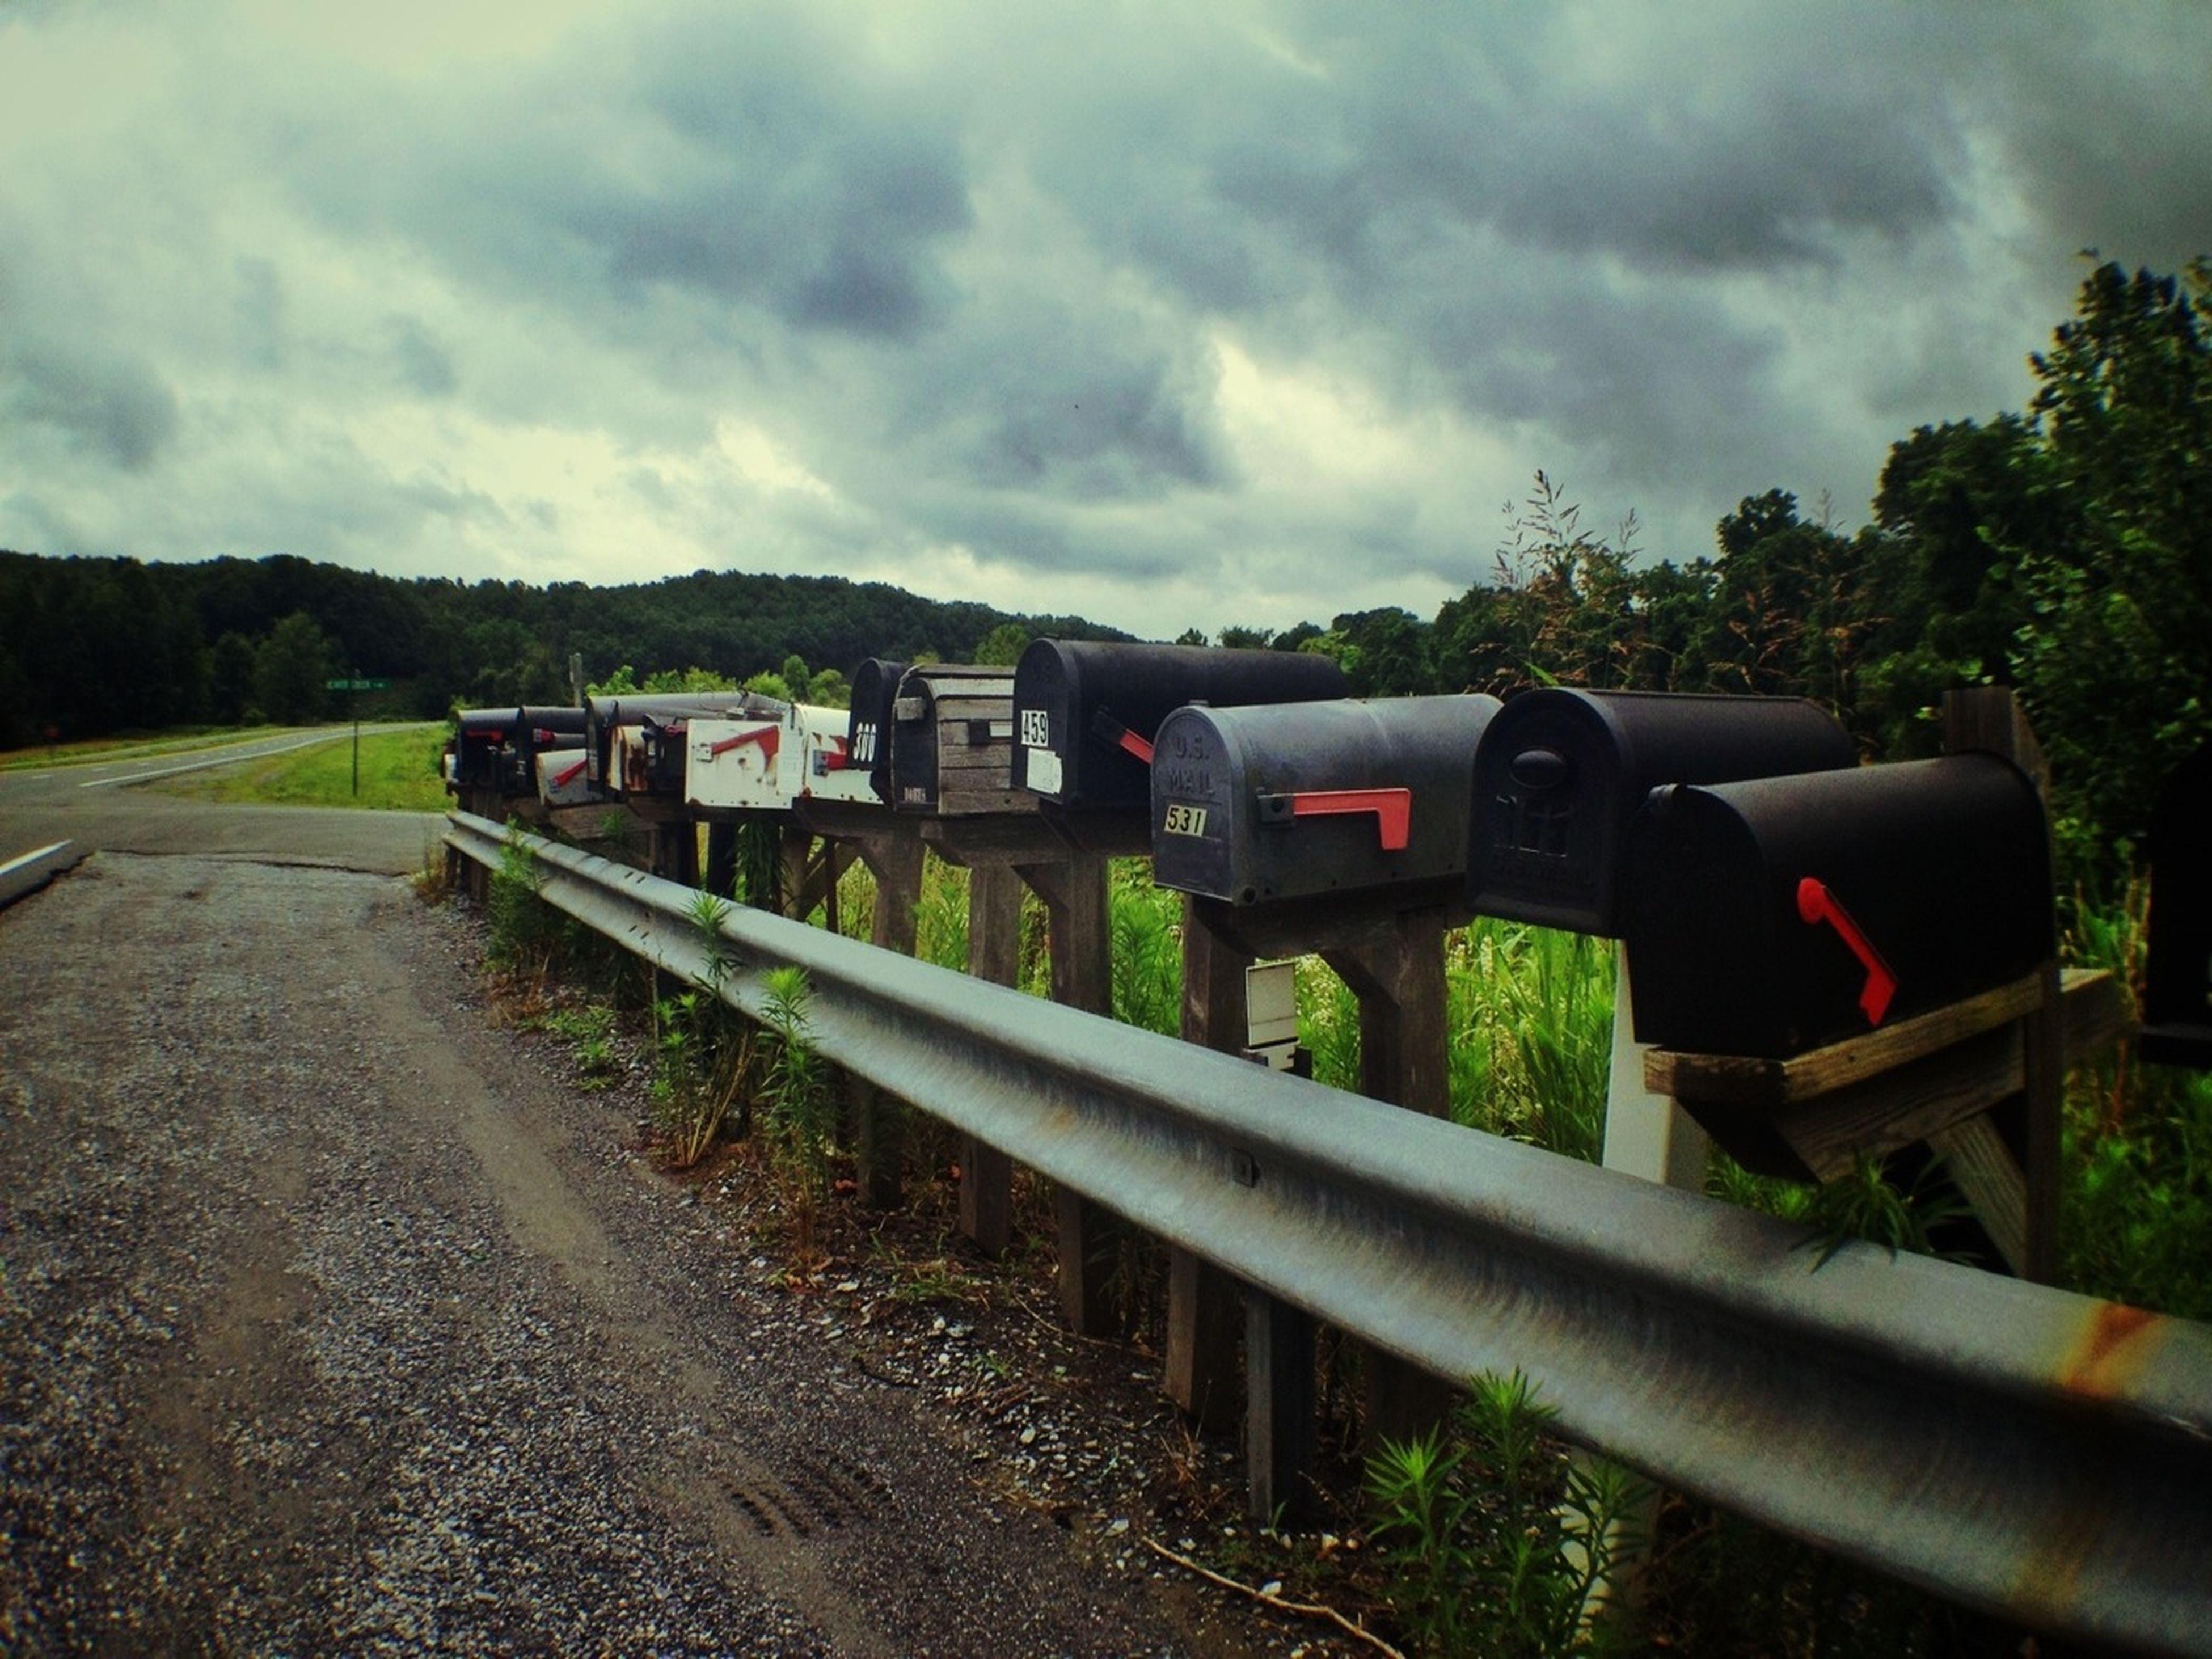 Post Code Envy Shootermag AMPt_community EyeEm Best Shots Rural Fragments